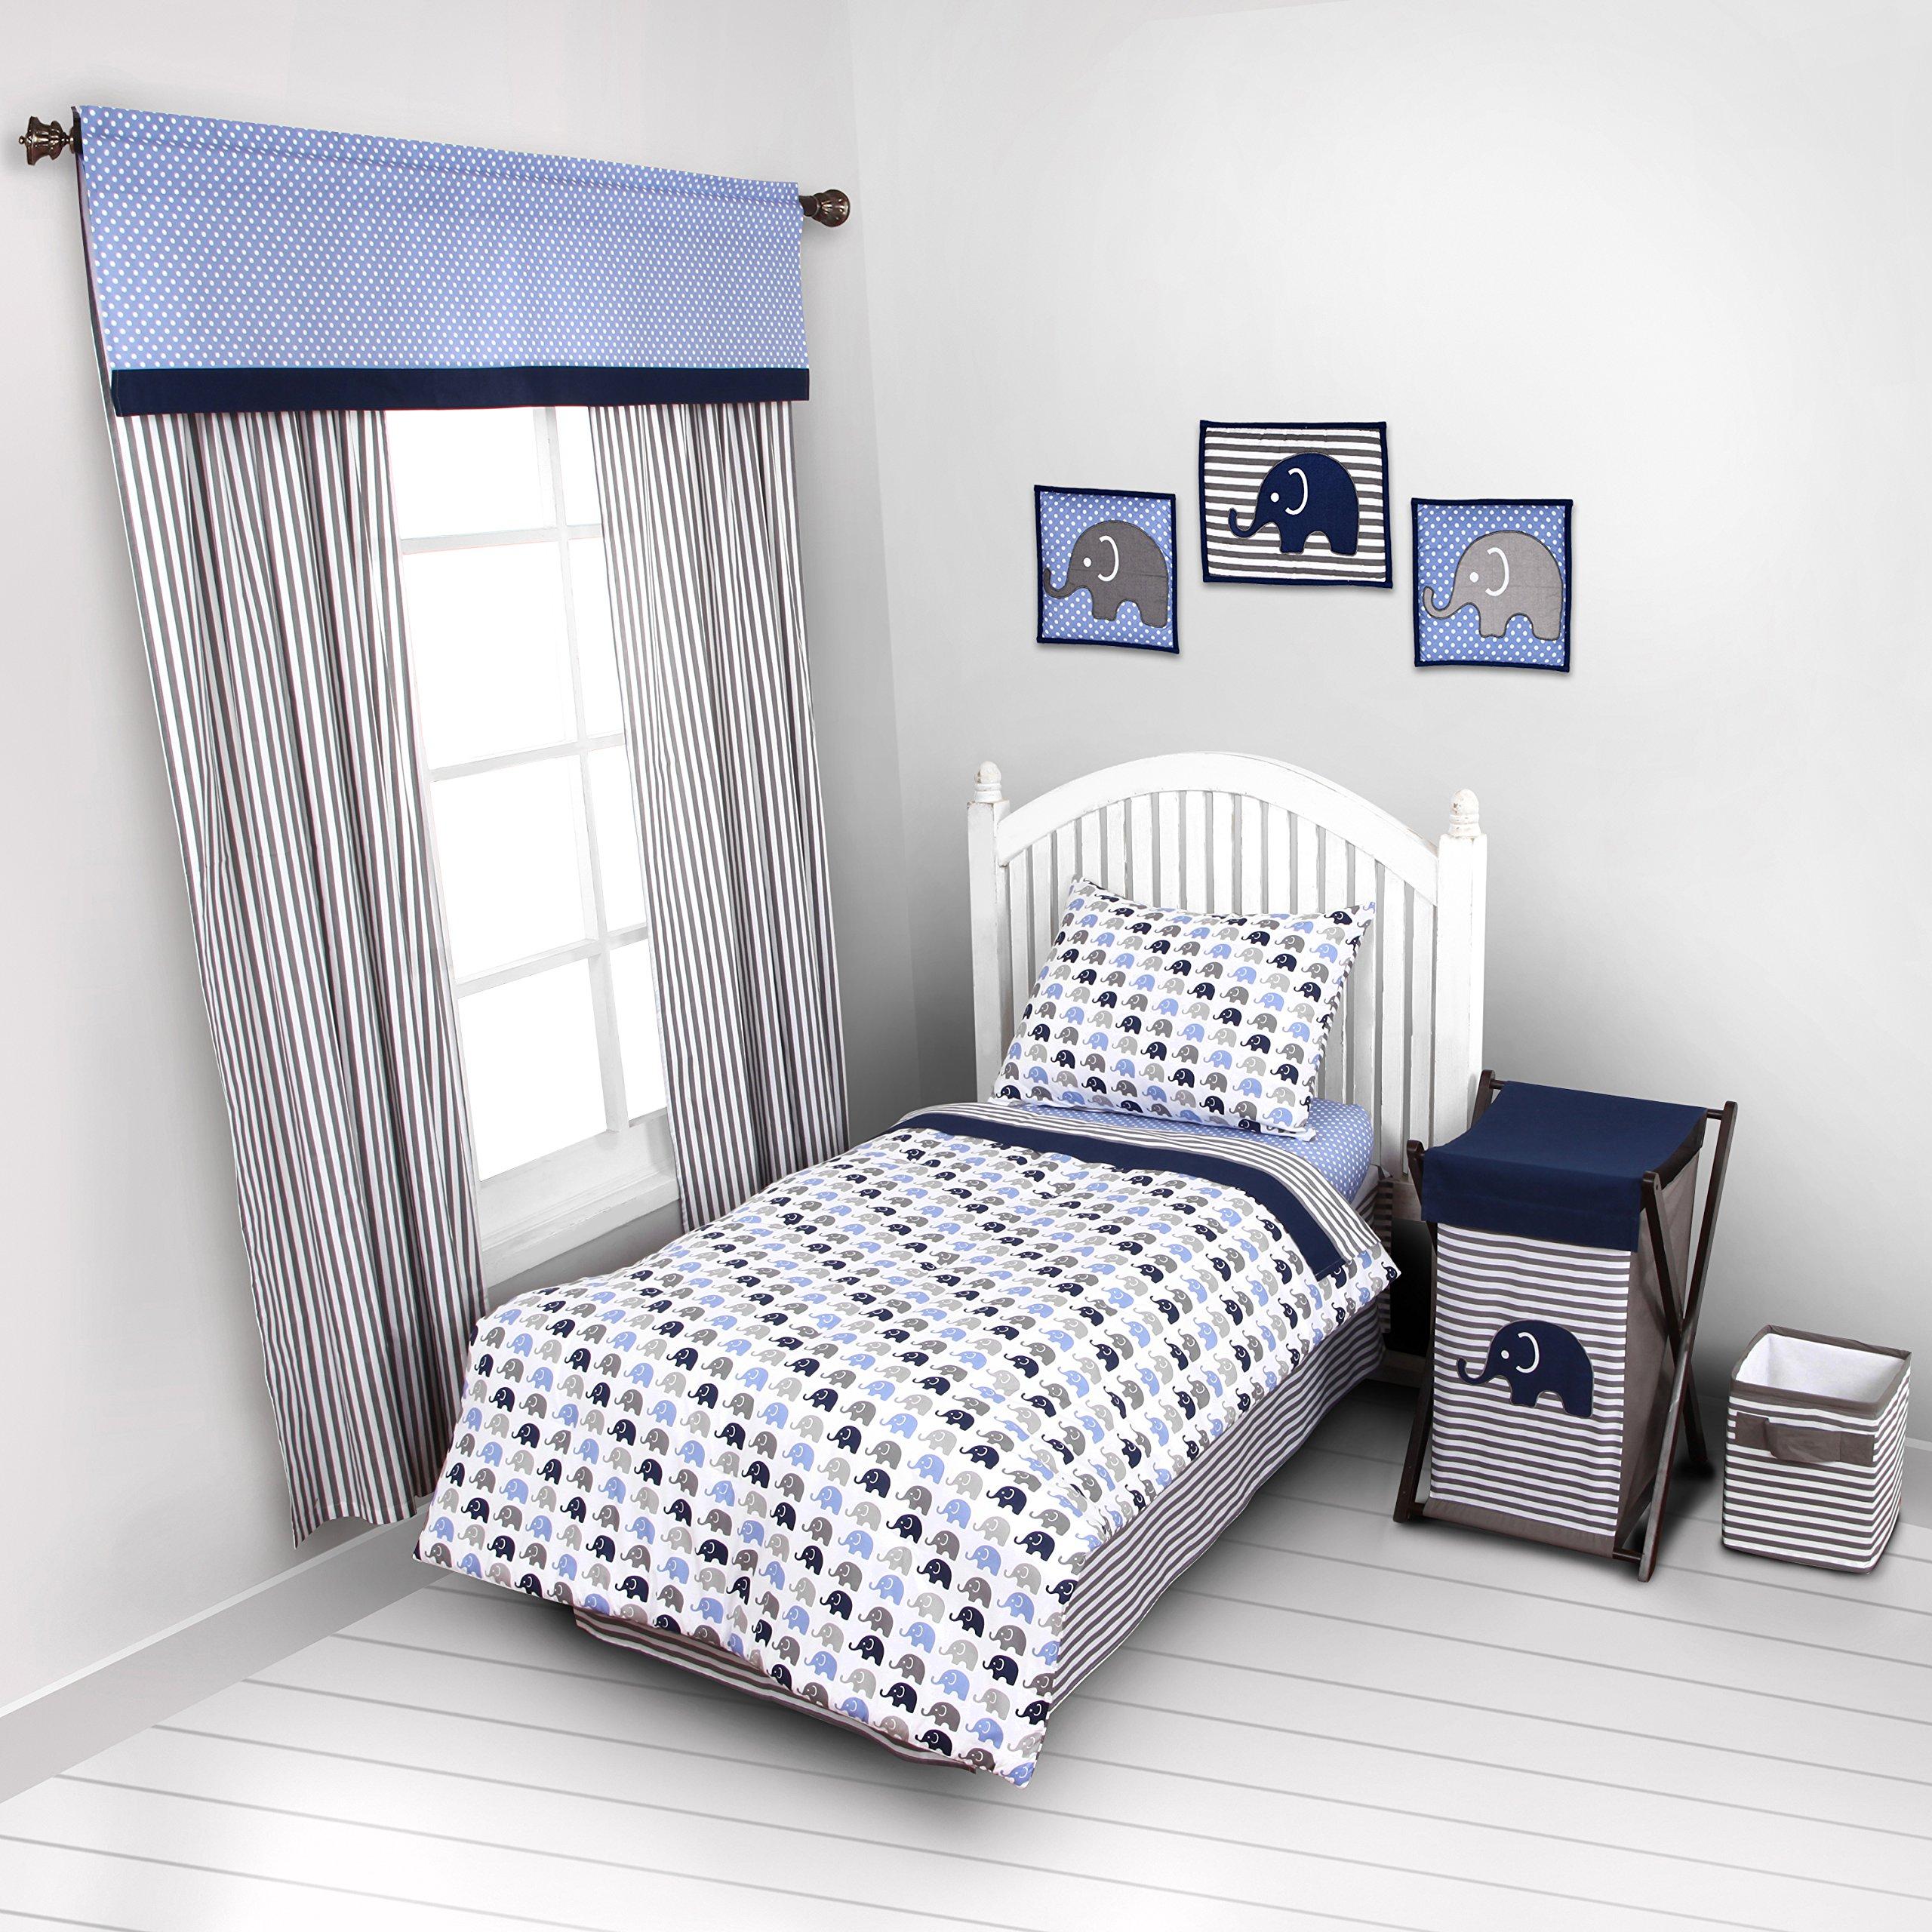 Elephants Blue/Grey 4 pc Toddler Bedding Set